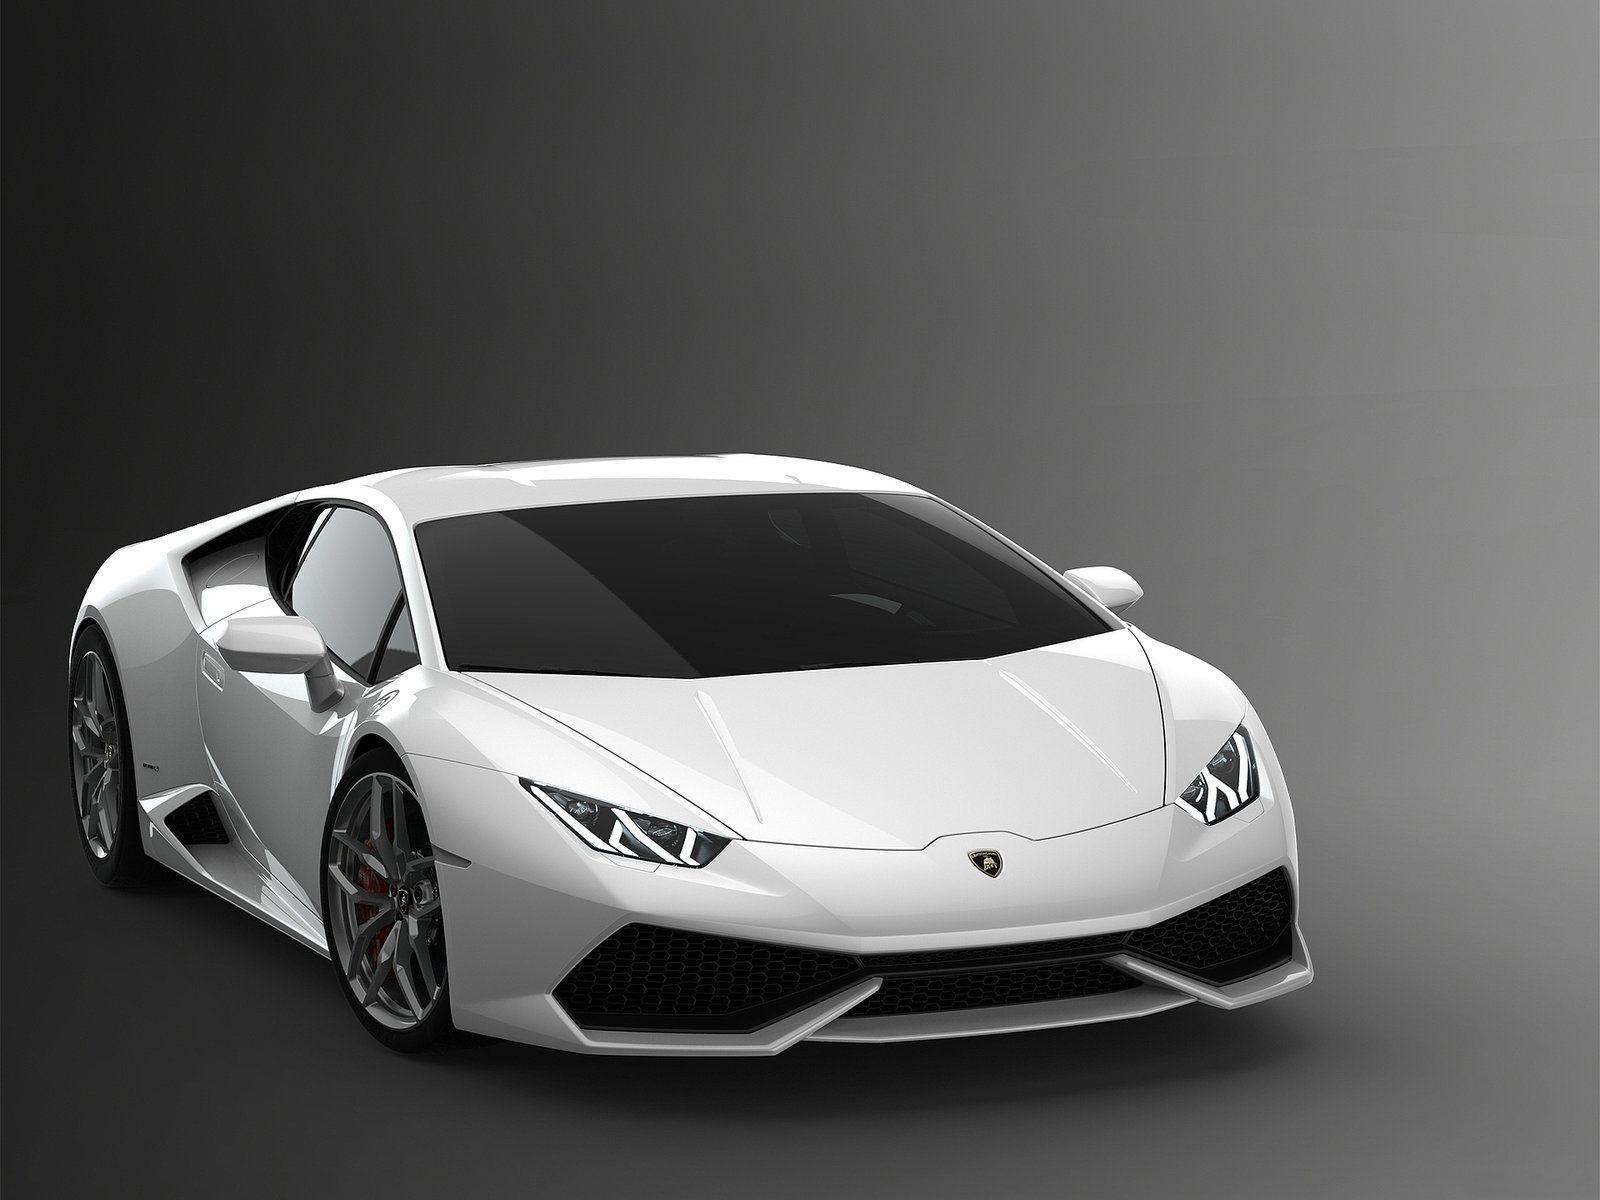 2015 fantastic cars hd wallpapers - Lamborghini Huracan Hd Wallpaper